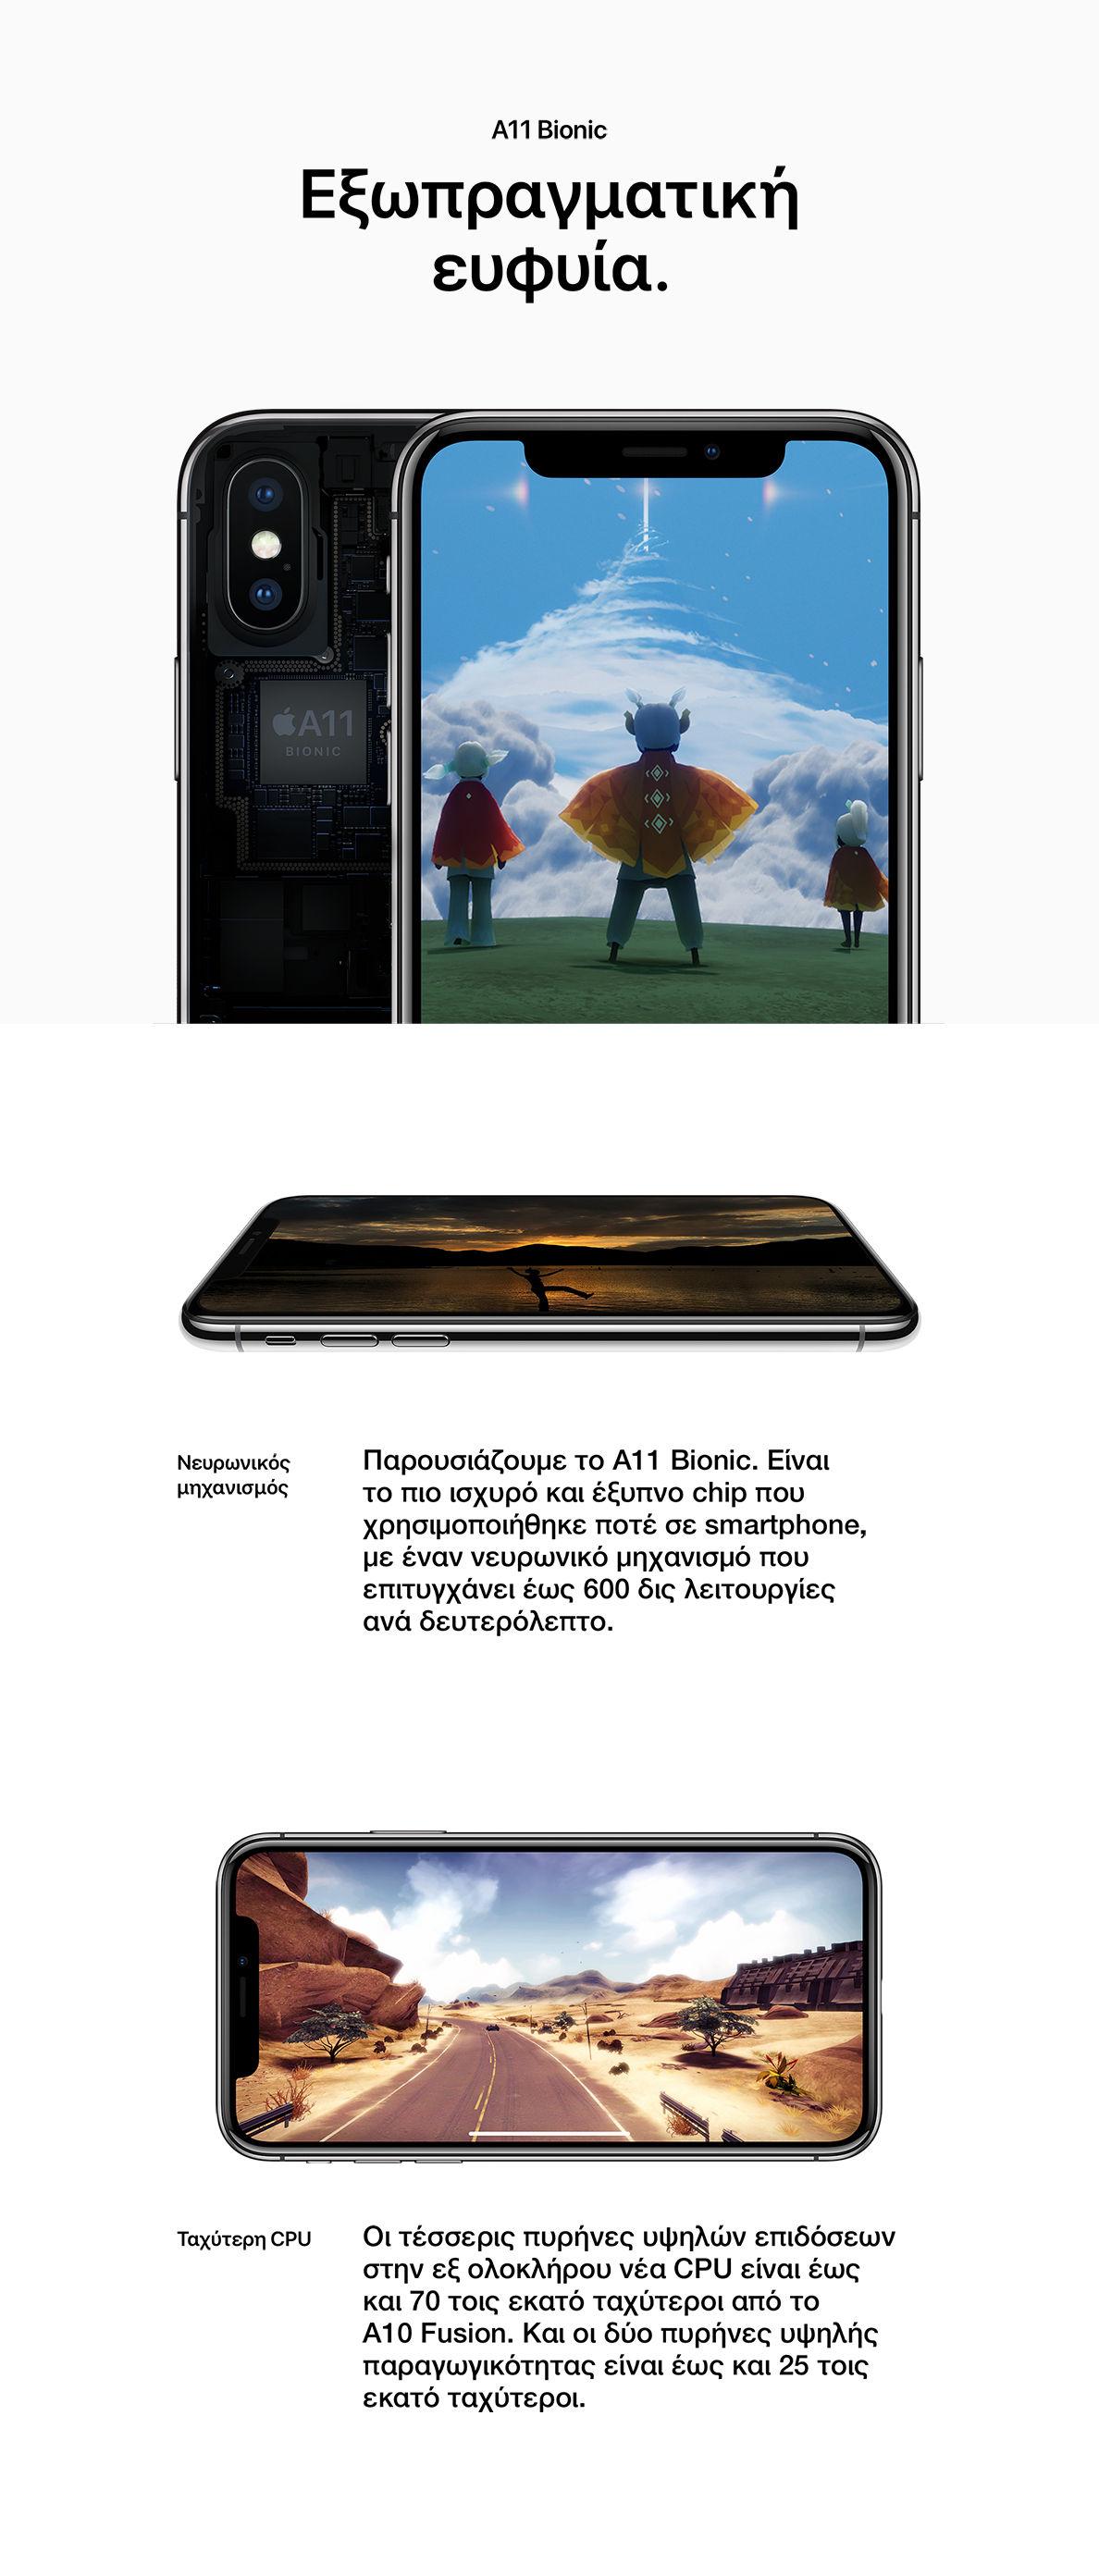 iPhonex-agora-Ellada-Mediamarkt-public-kotsovolos-germanos-iPhoneX-diathesimo-gia-paraggelia-november-2017 (10)